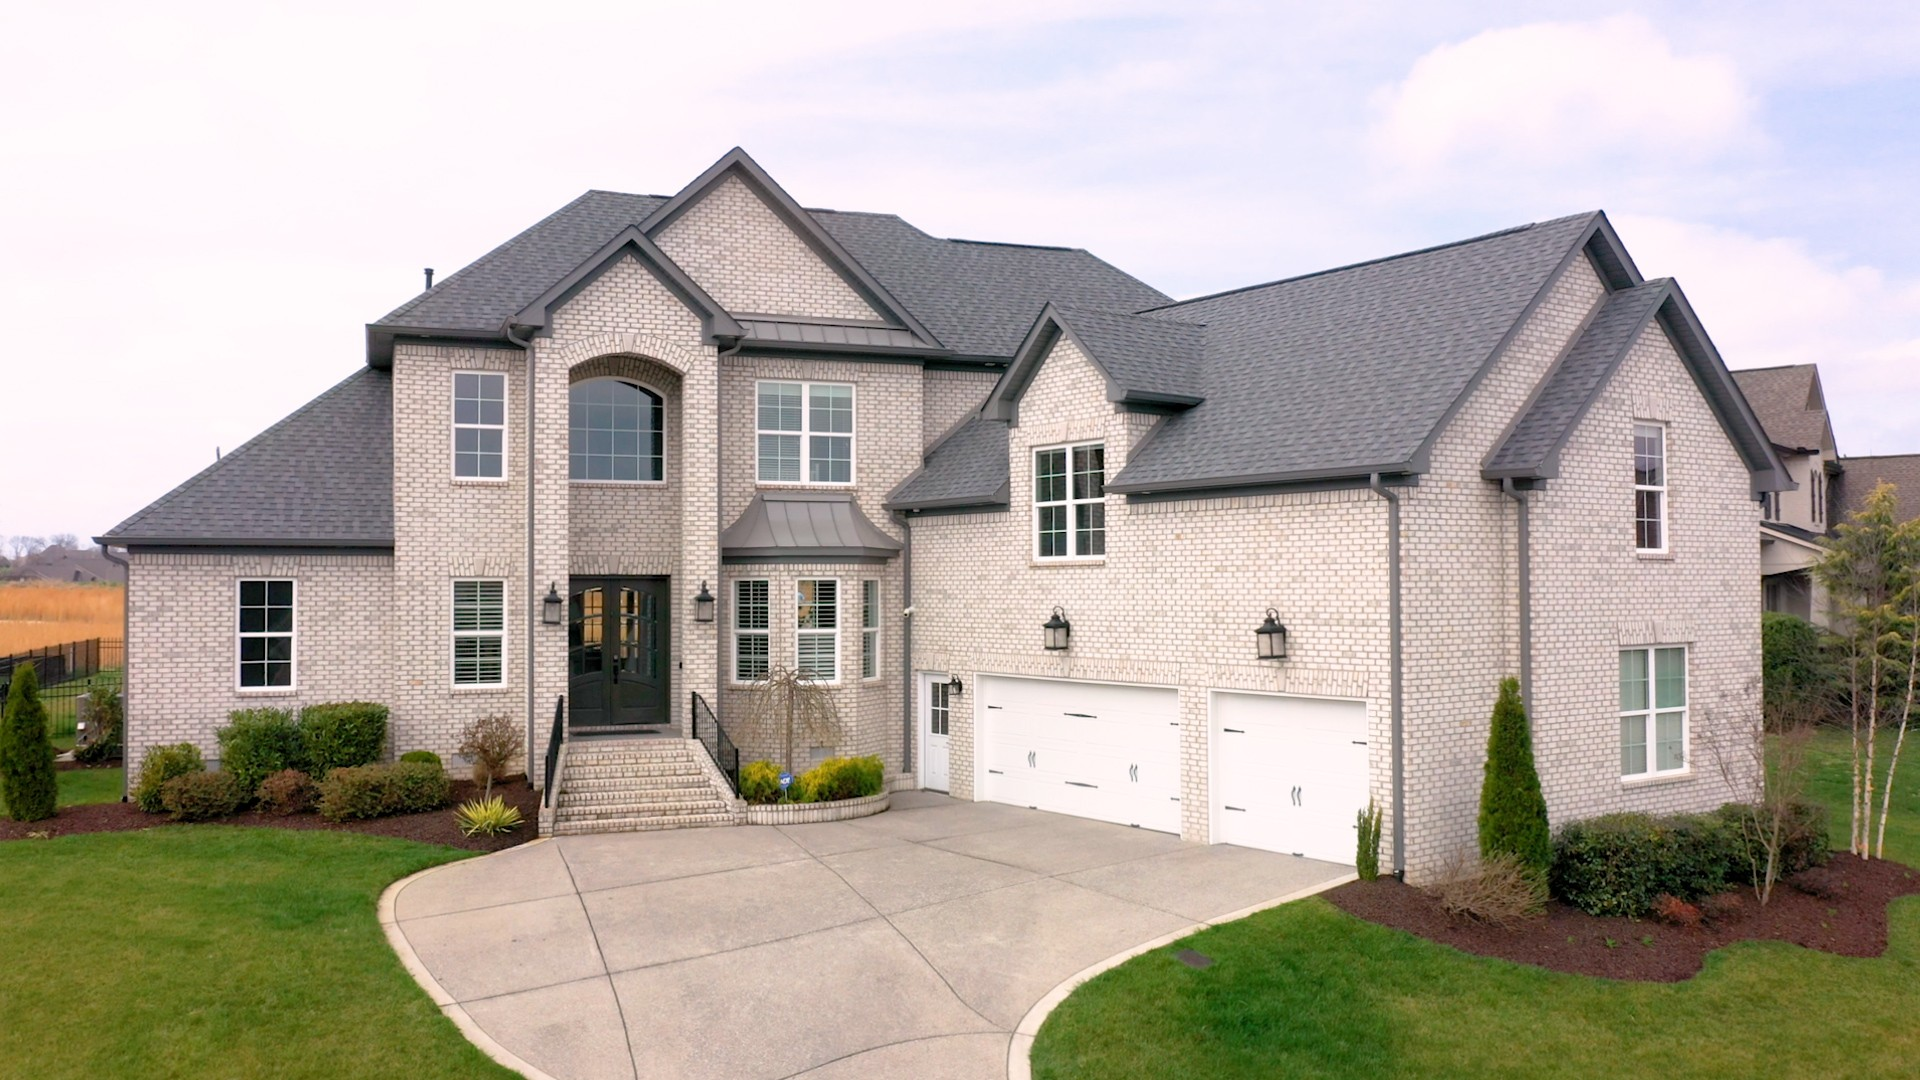 1069 Albatross Way Property Photo - Gallatin, TN real estate listing